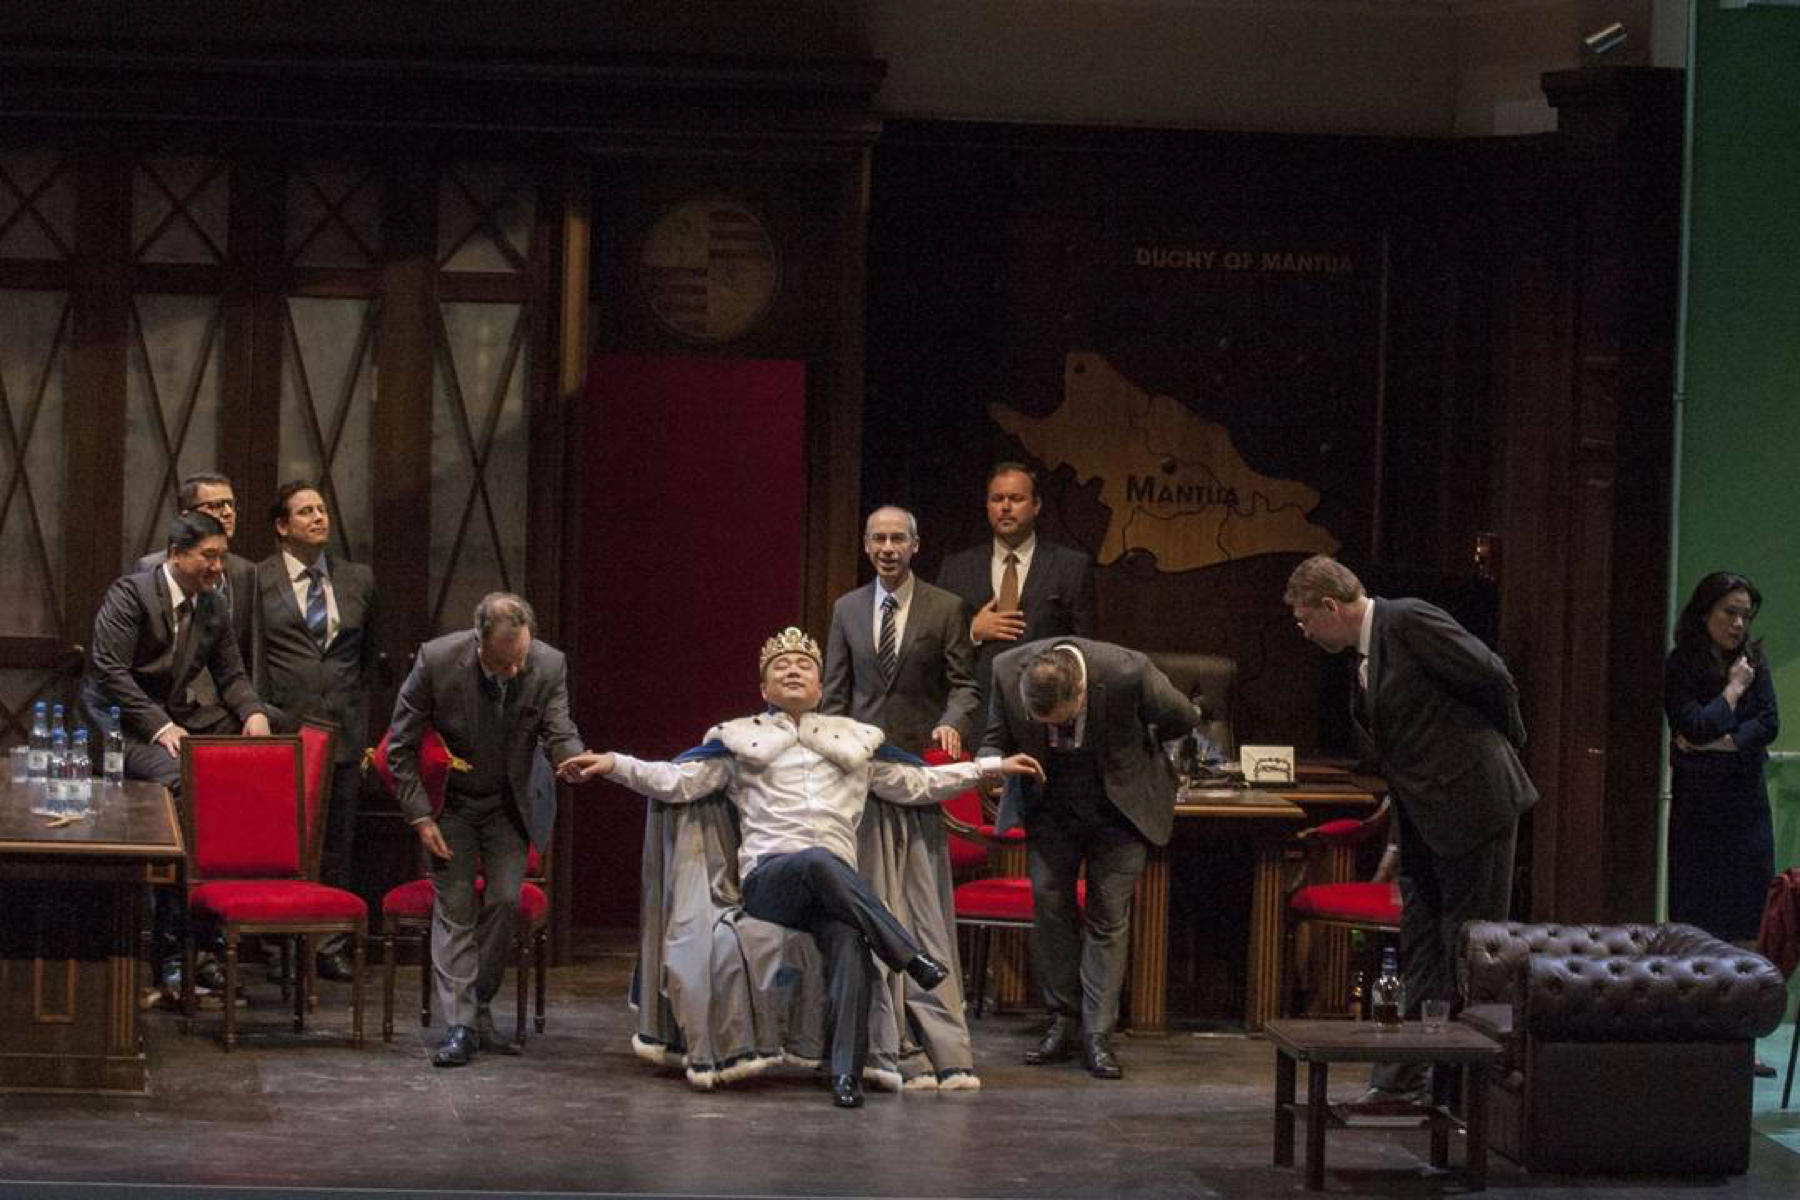 Share your Opera Titelbild - Rigoletto